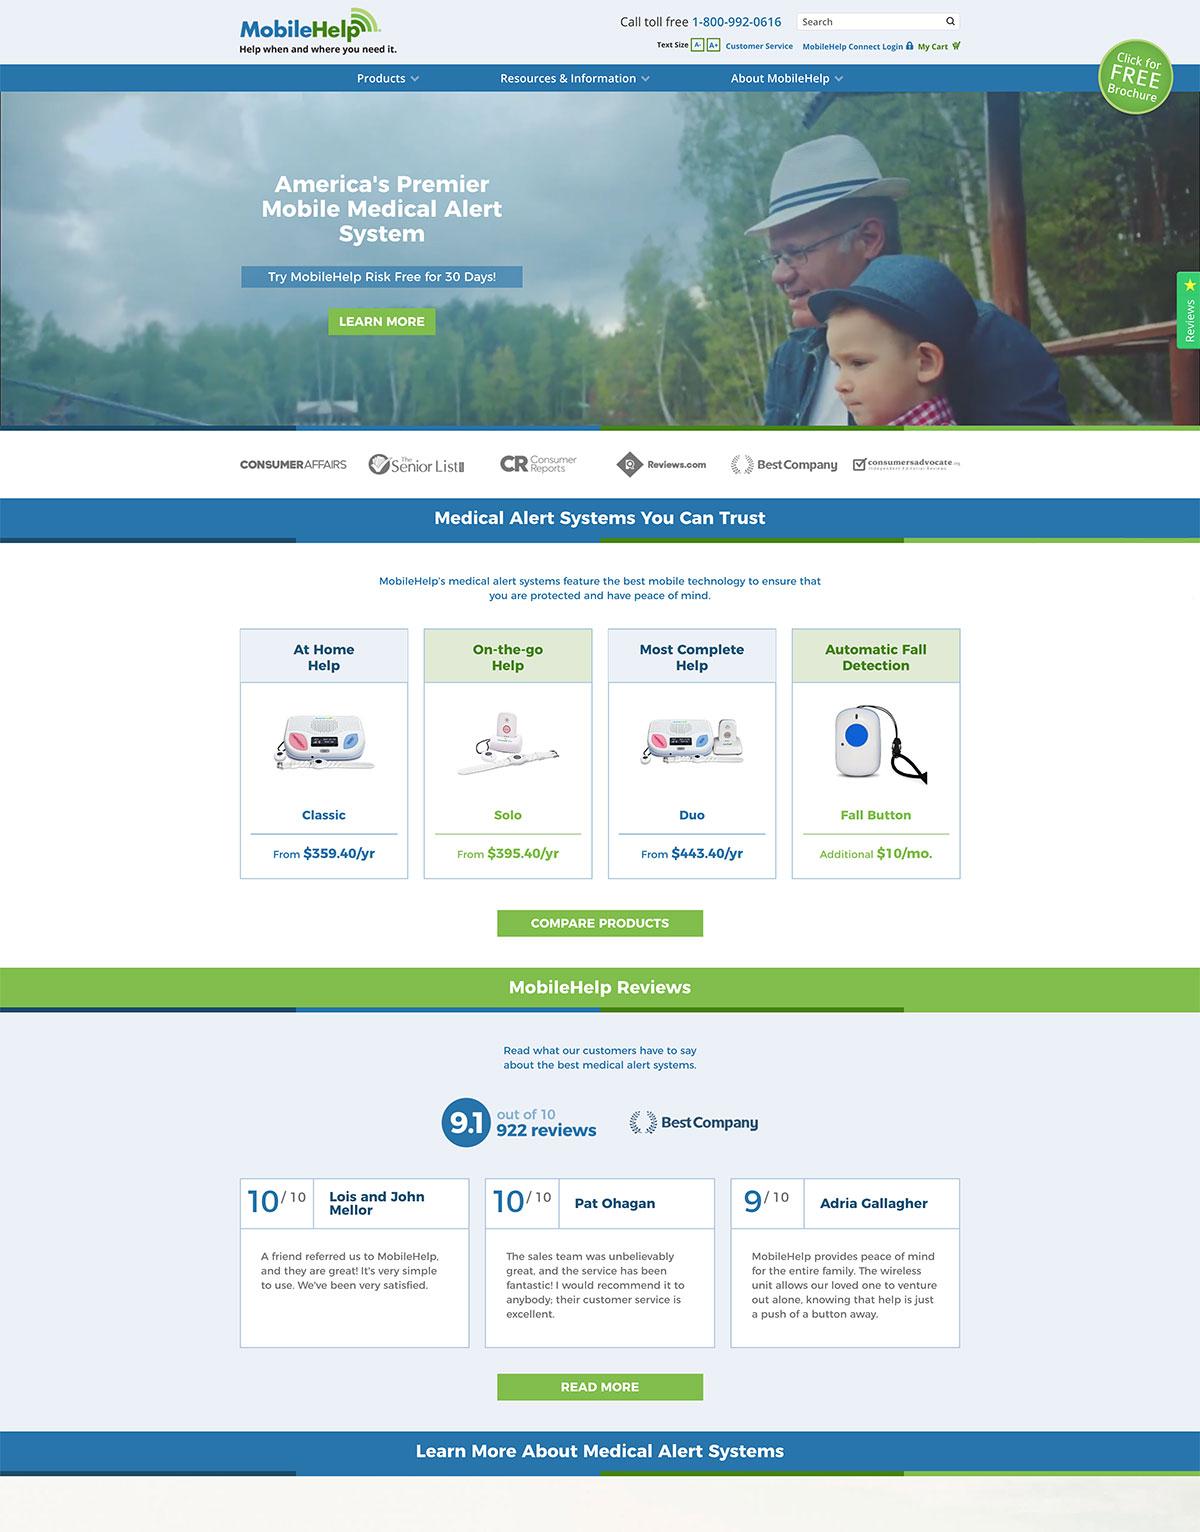 Bootstrap Tabs Portfolio - JSFiddle